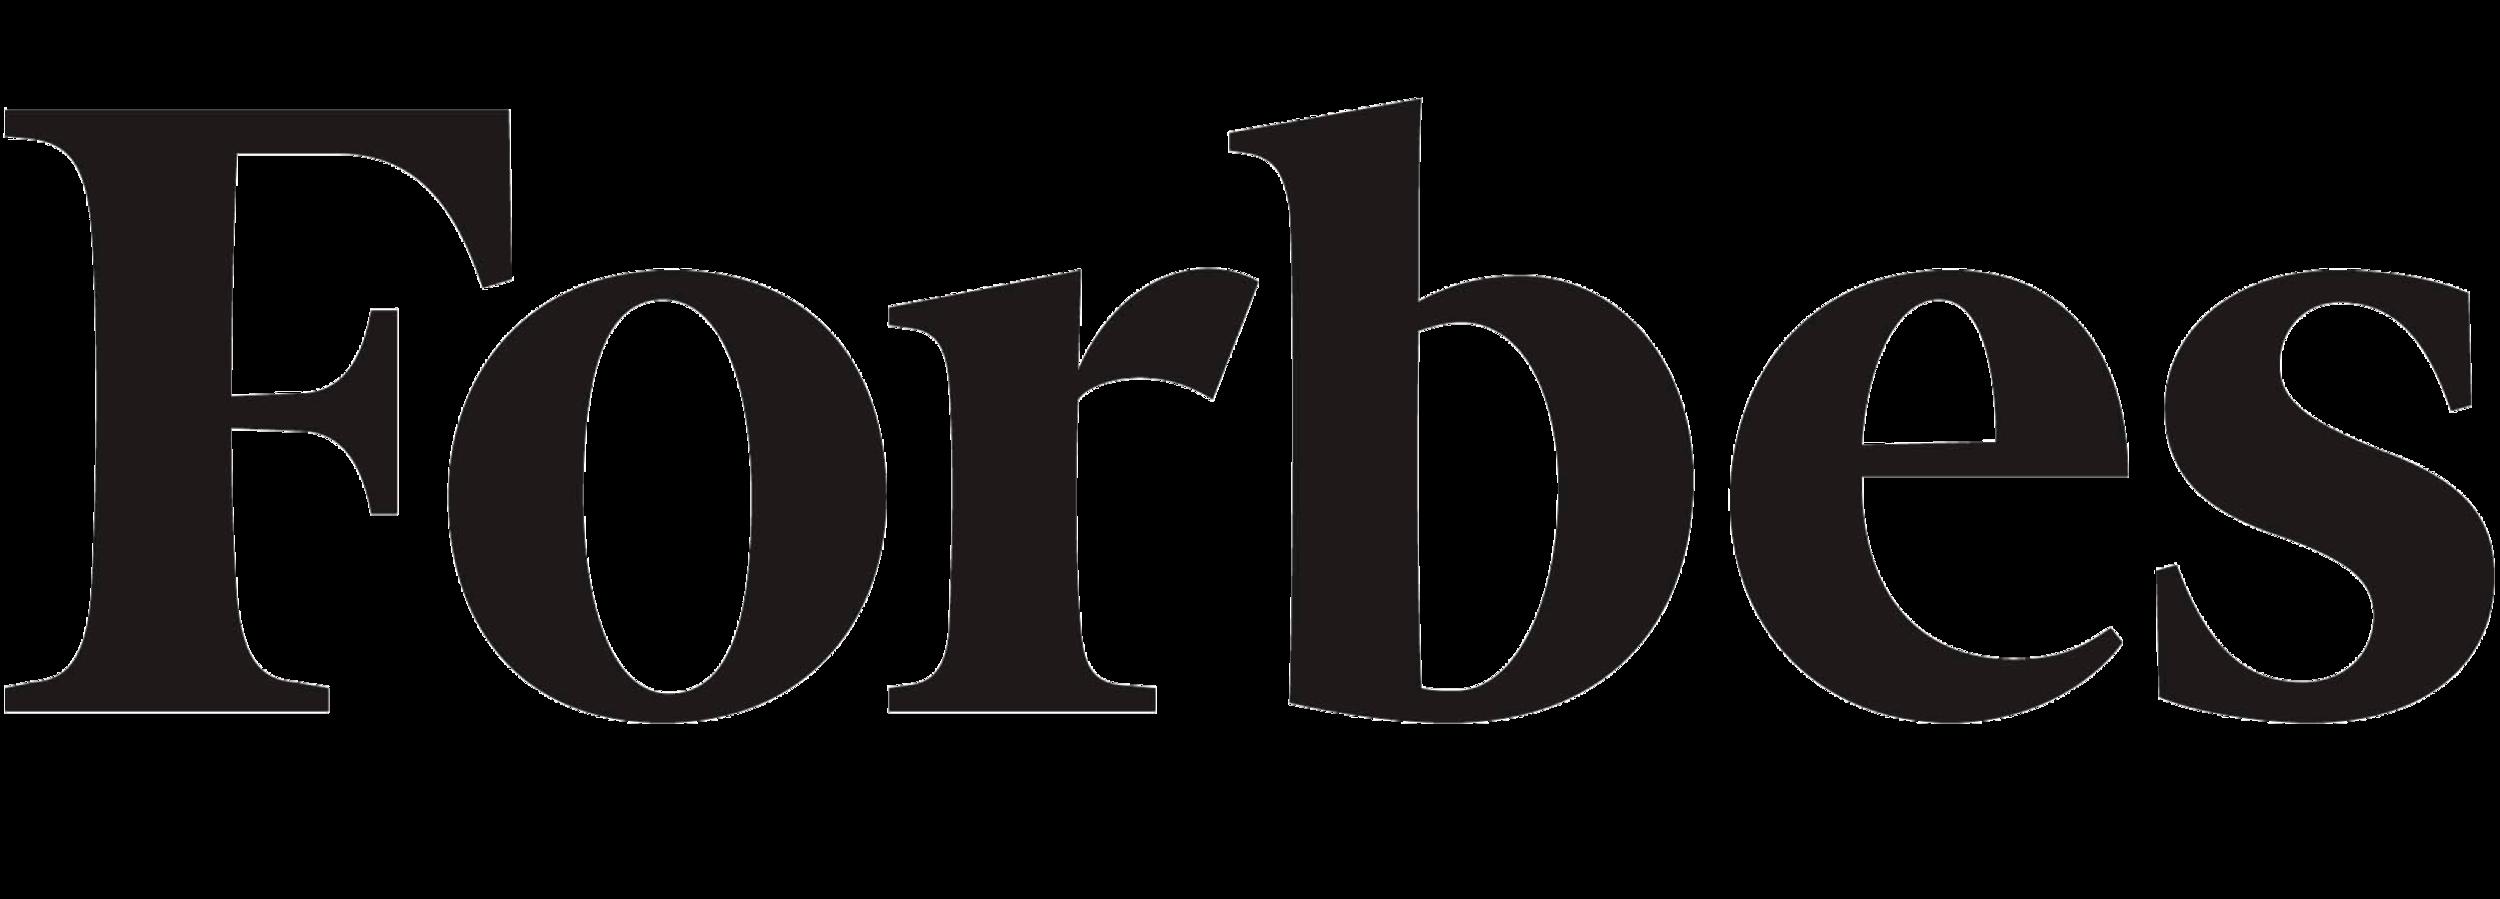 Forbes-Black-Logo-PNG-03003-2-e1517347676630.png